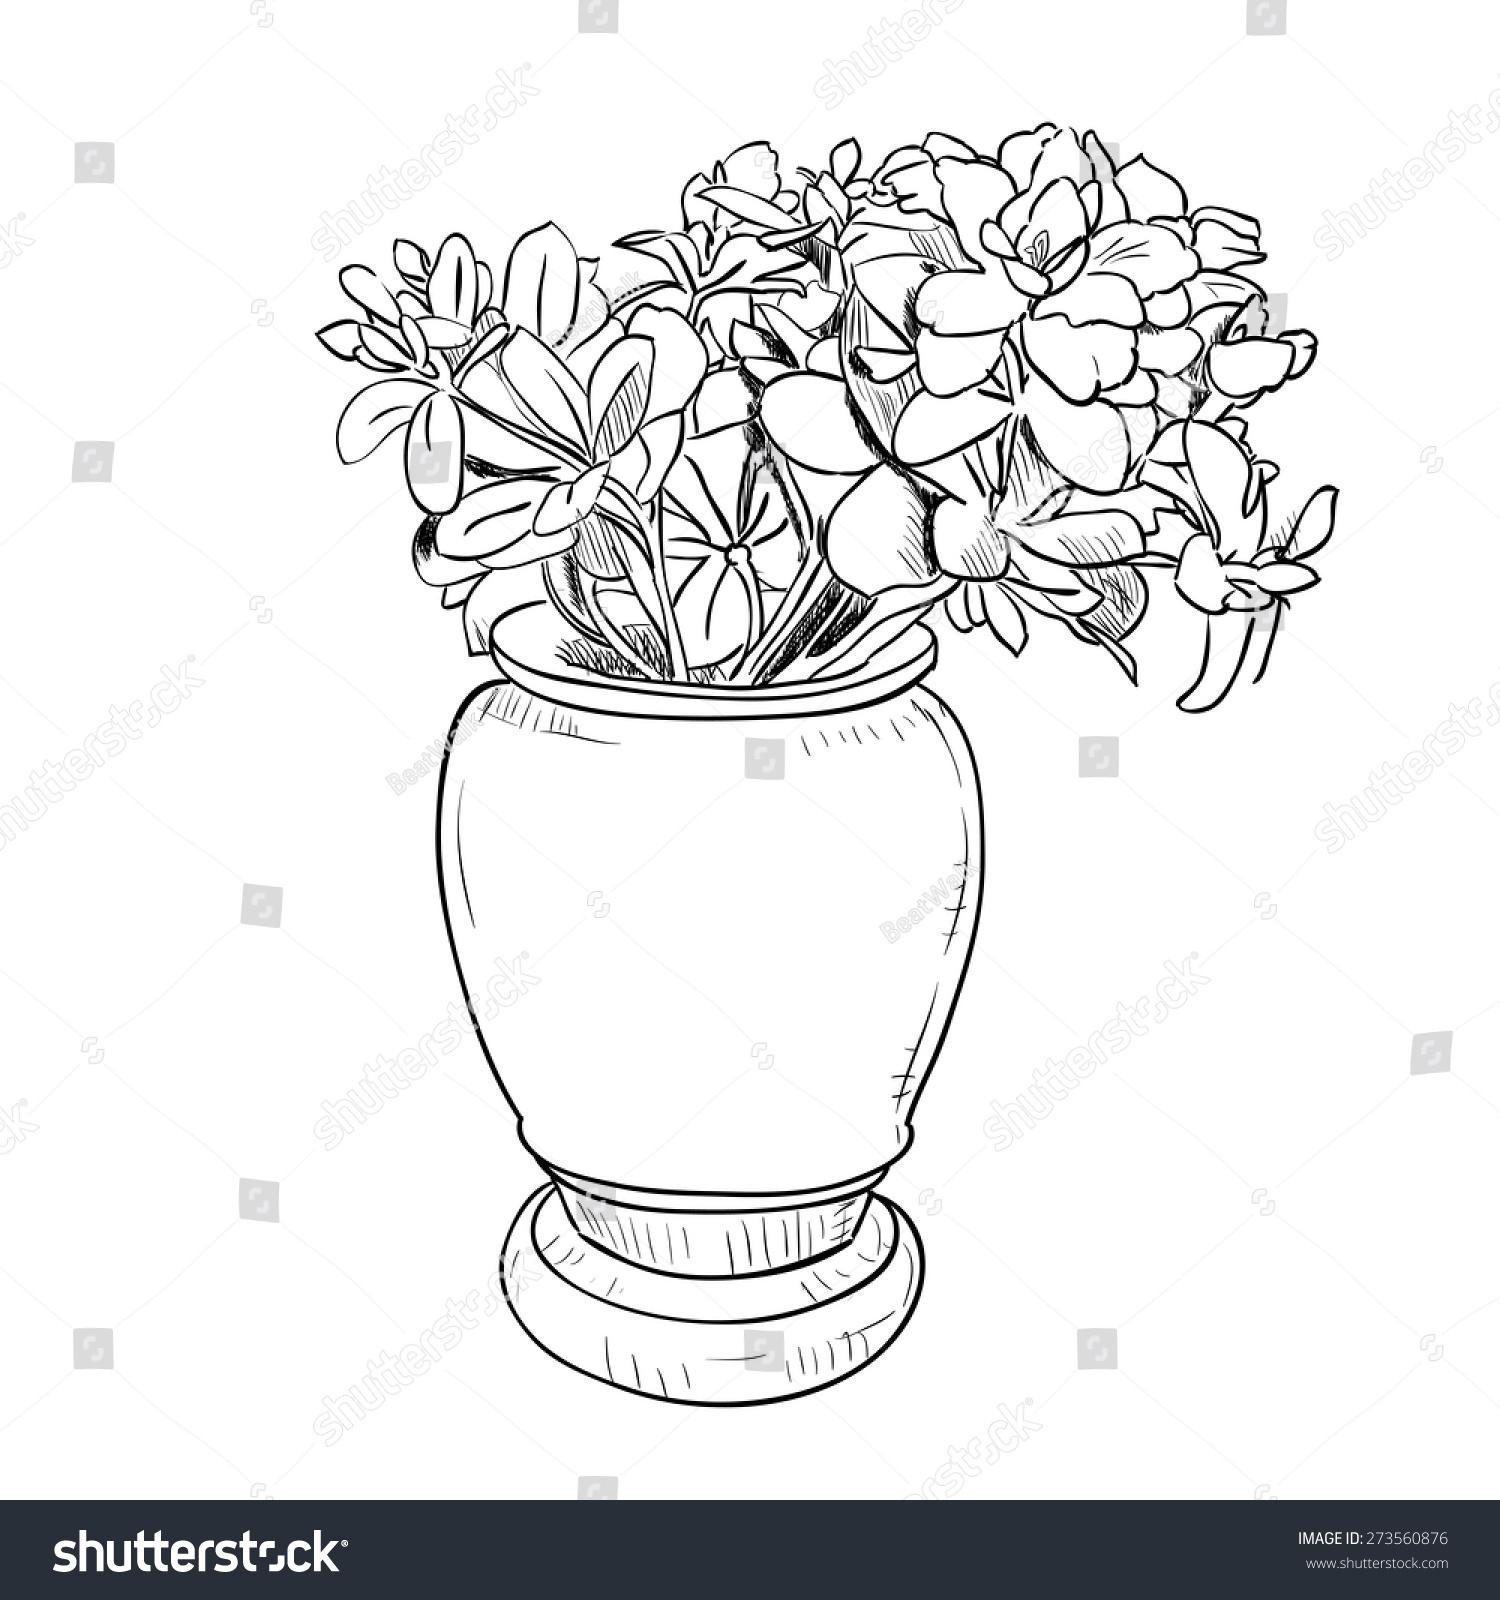 Vector Drawing Sketch Vase Flowers Hand Stock Vector